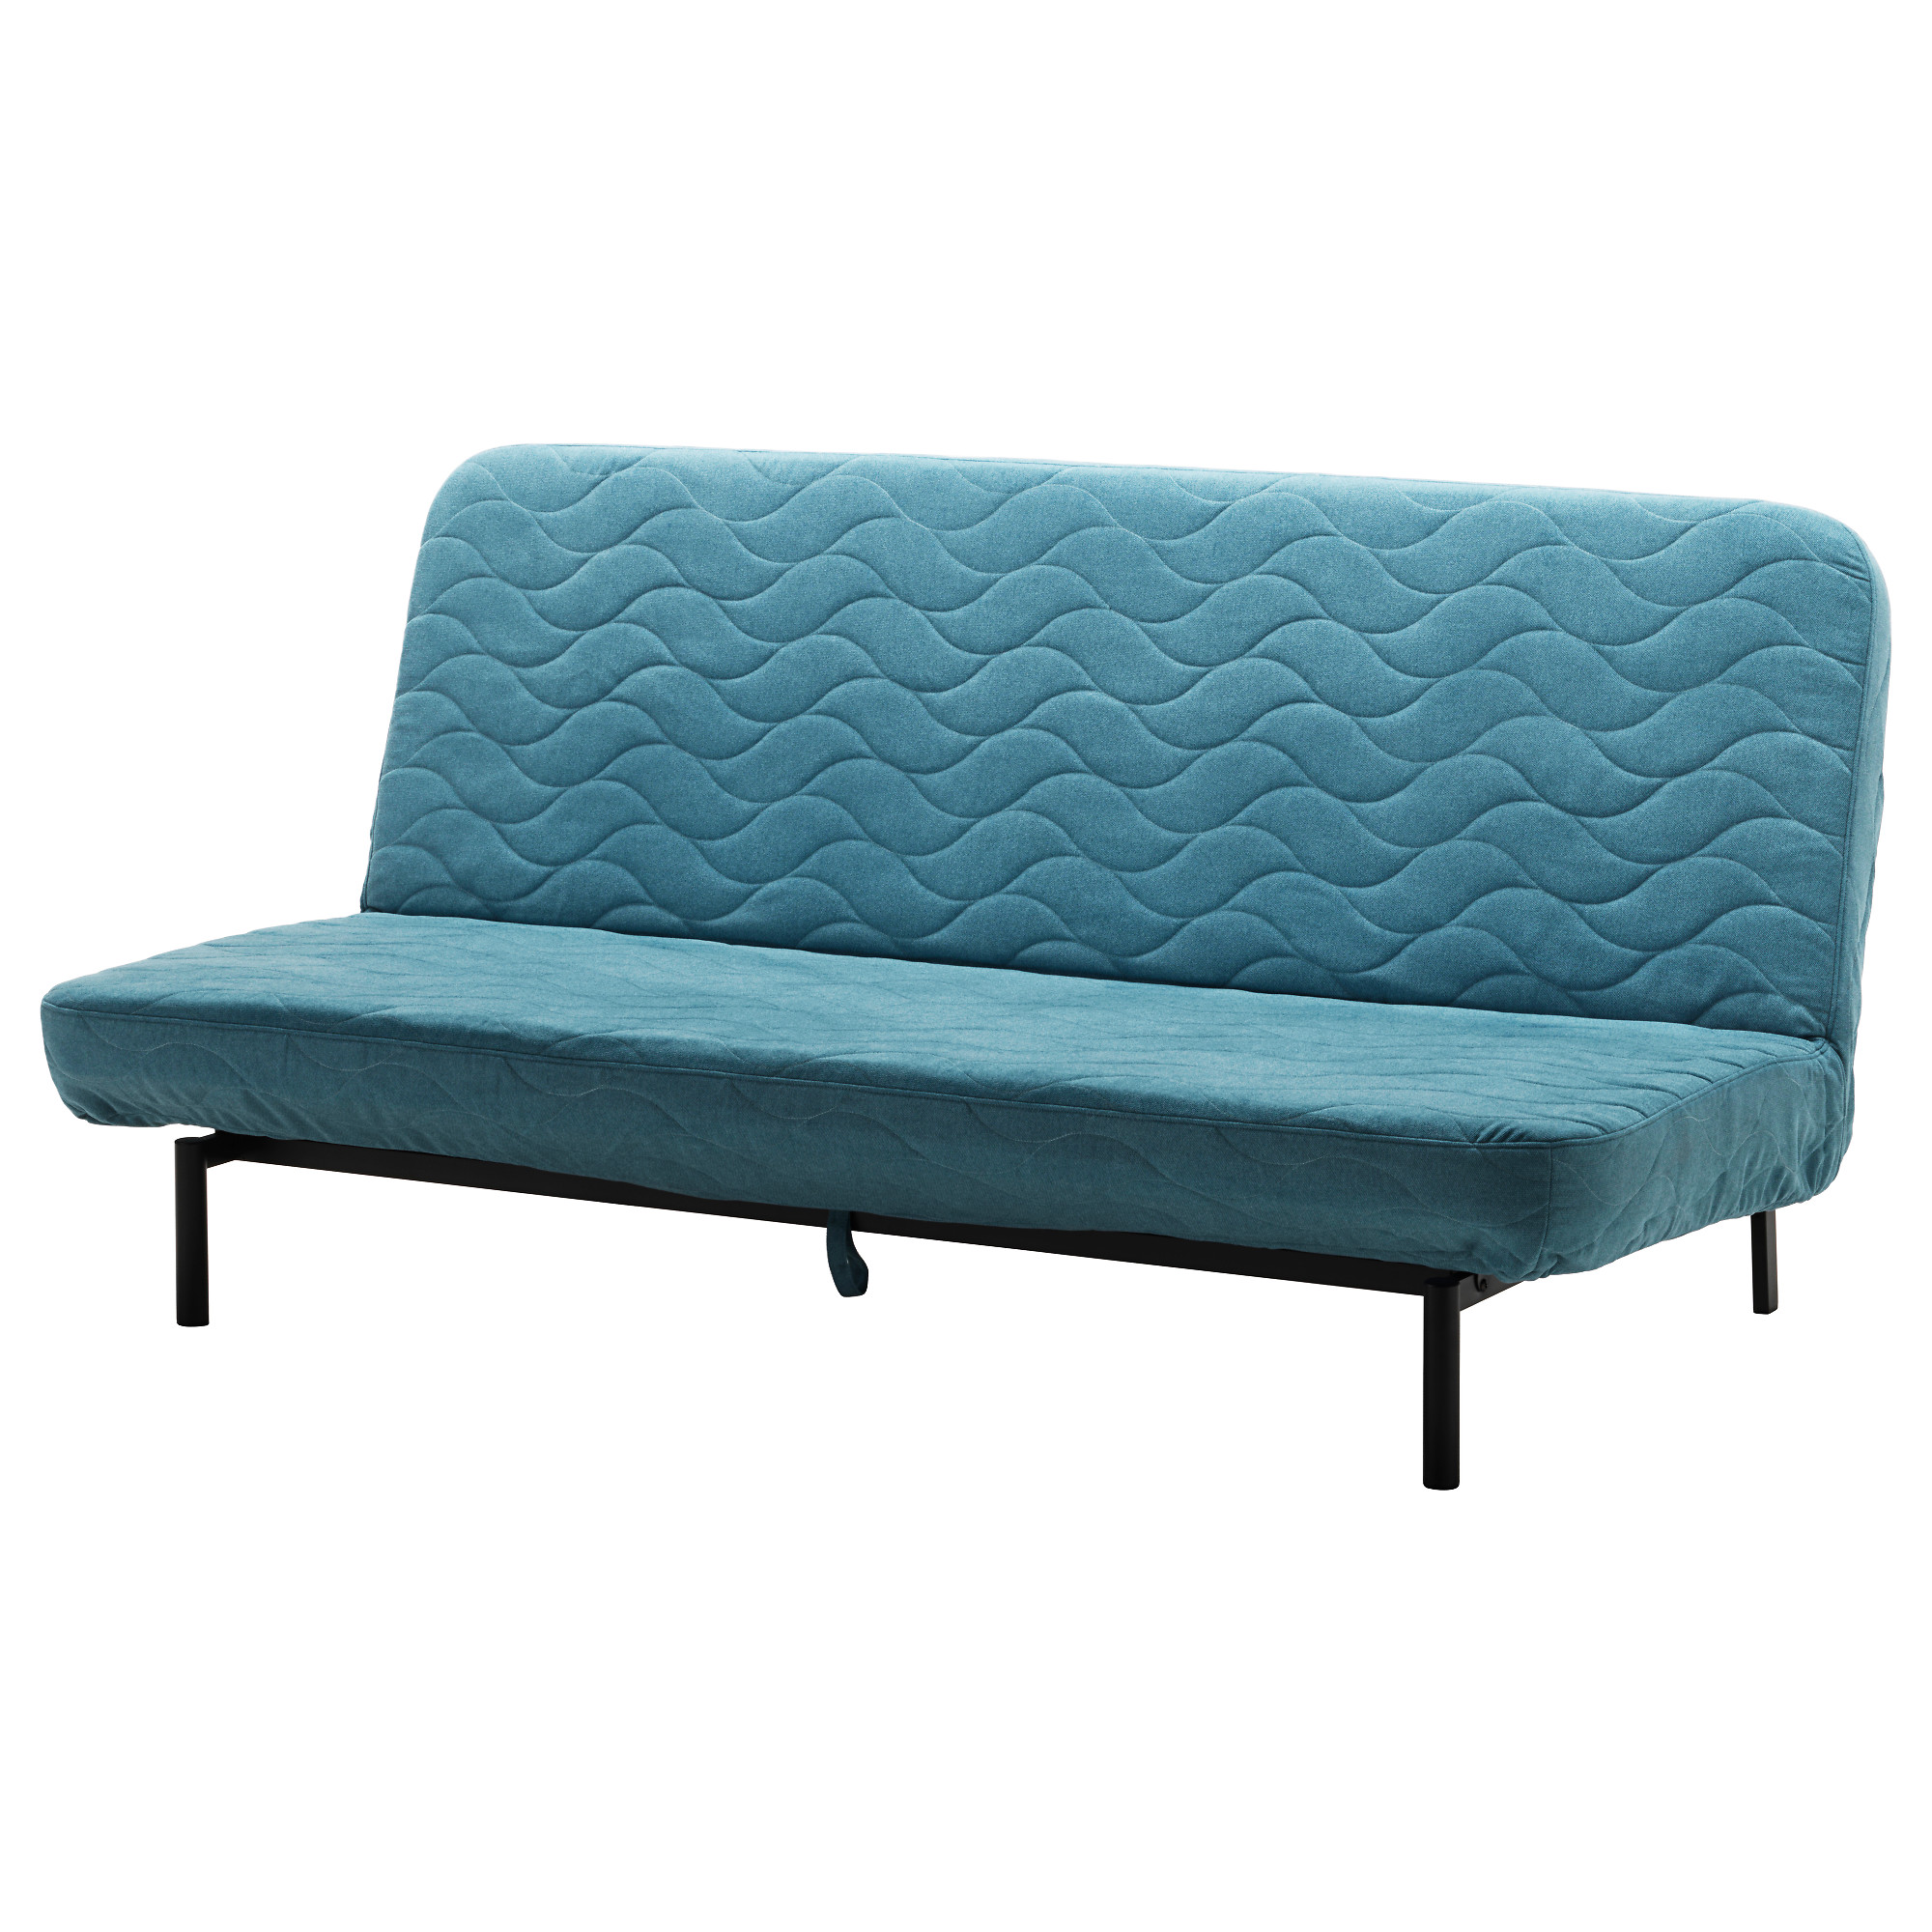 futon sofa nyhamn sleeper sofa, with foam mattress, borred green/blue width: 78 3 JGRRMLH